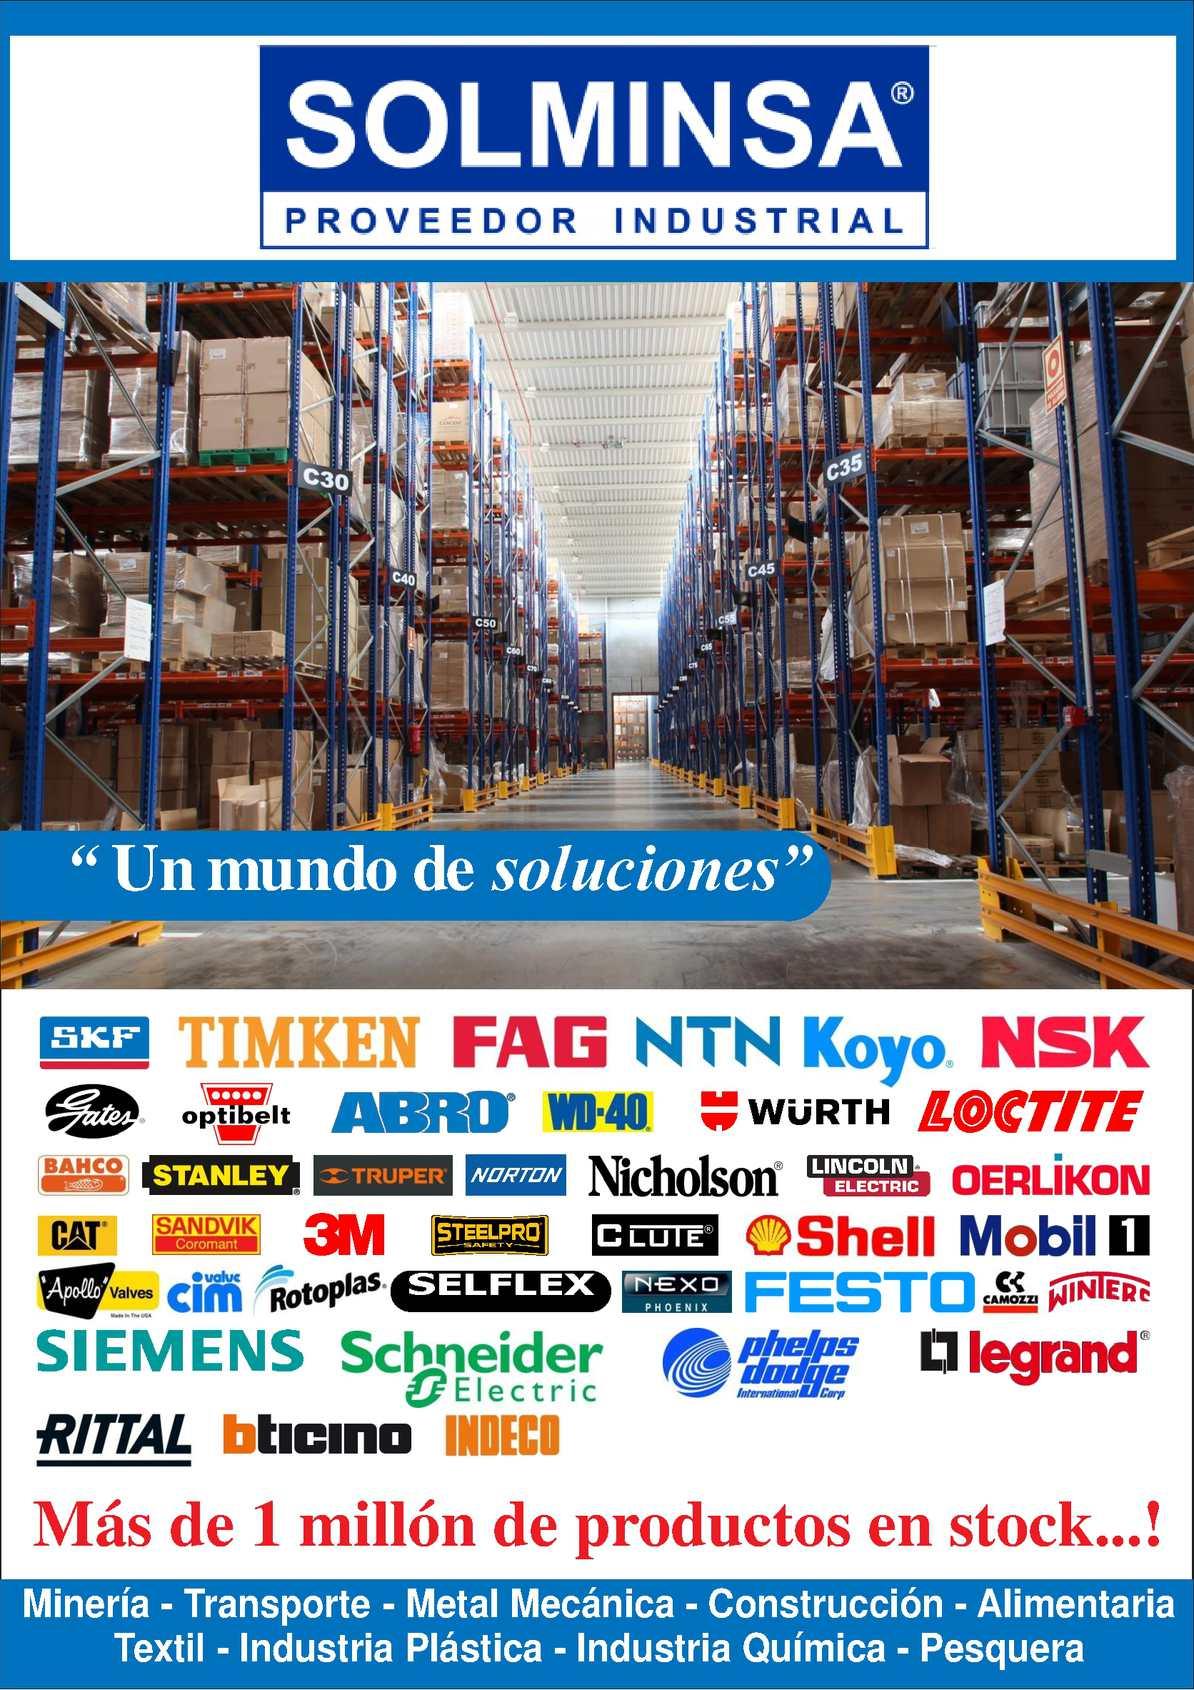 Brochure Solminsa Proveedor Industrial